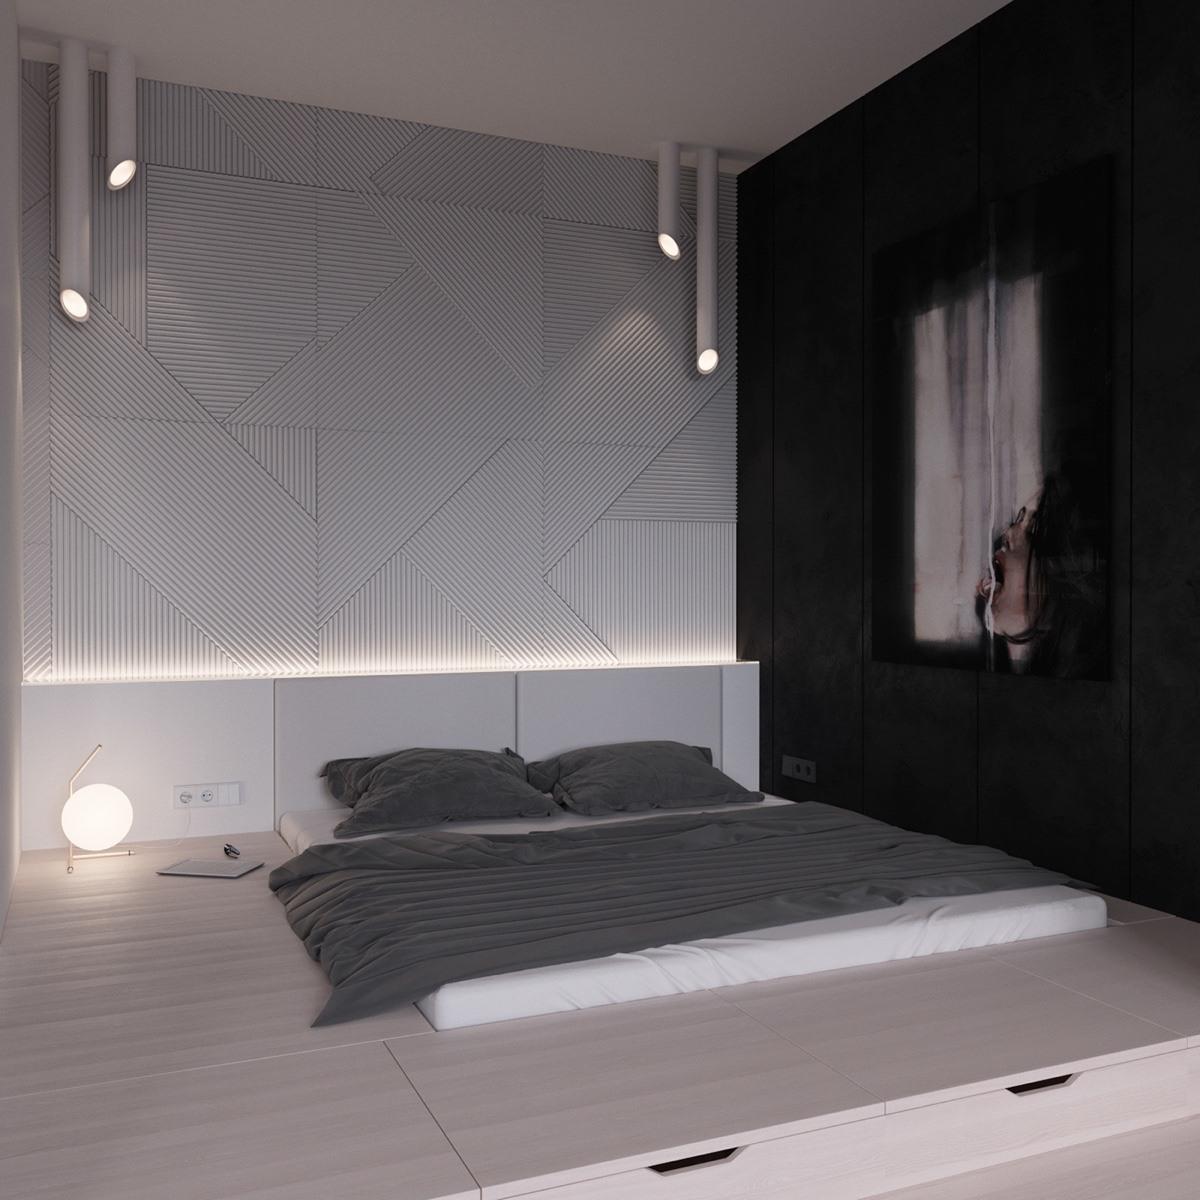 Bedroom Furniture China Bedroom Carpet Layout Bedroom Decor Small Mens Apartment Bedroom: 59 Desain Kamar Tidur Nuansa Hitam Putih